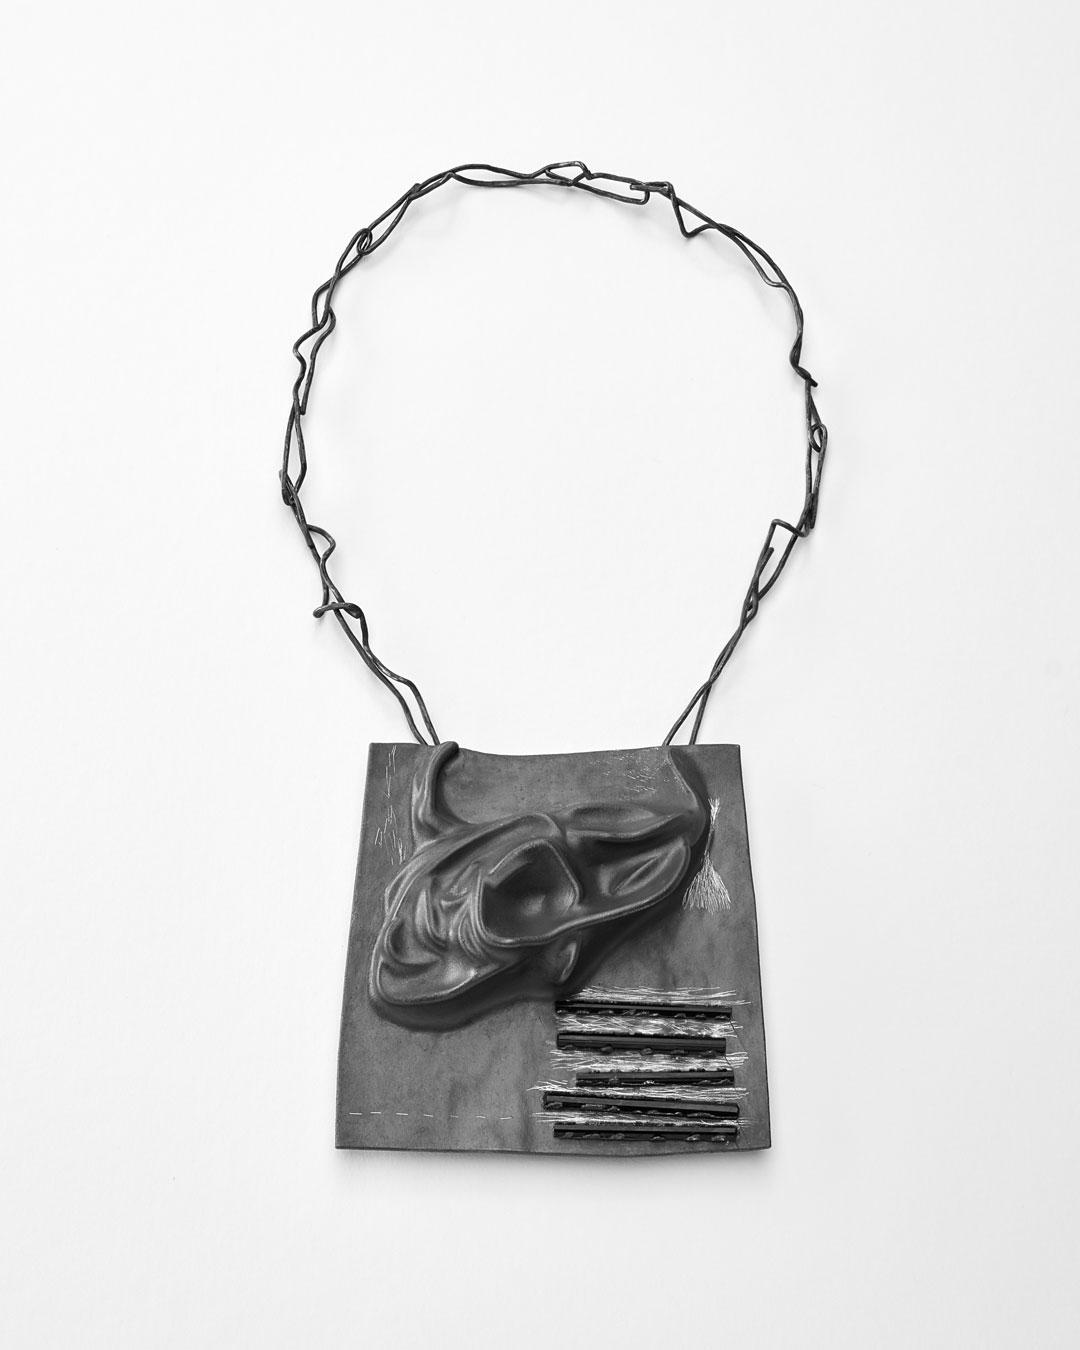 Iris Bodemer, Klang 2 (Sound 2), 2019, pendant; silver, thermoplastic, tourmaline, 100 x 100 x 20 mm, €4000